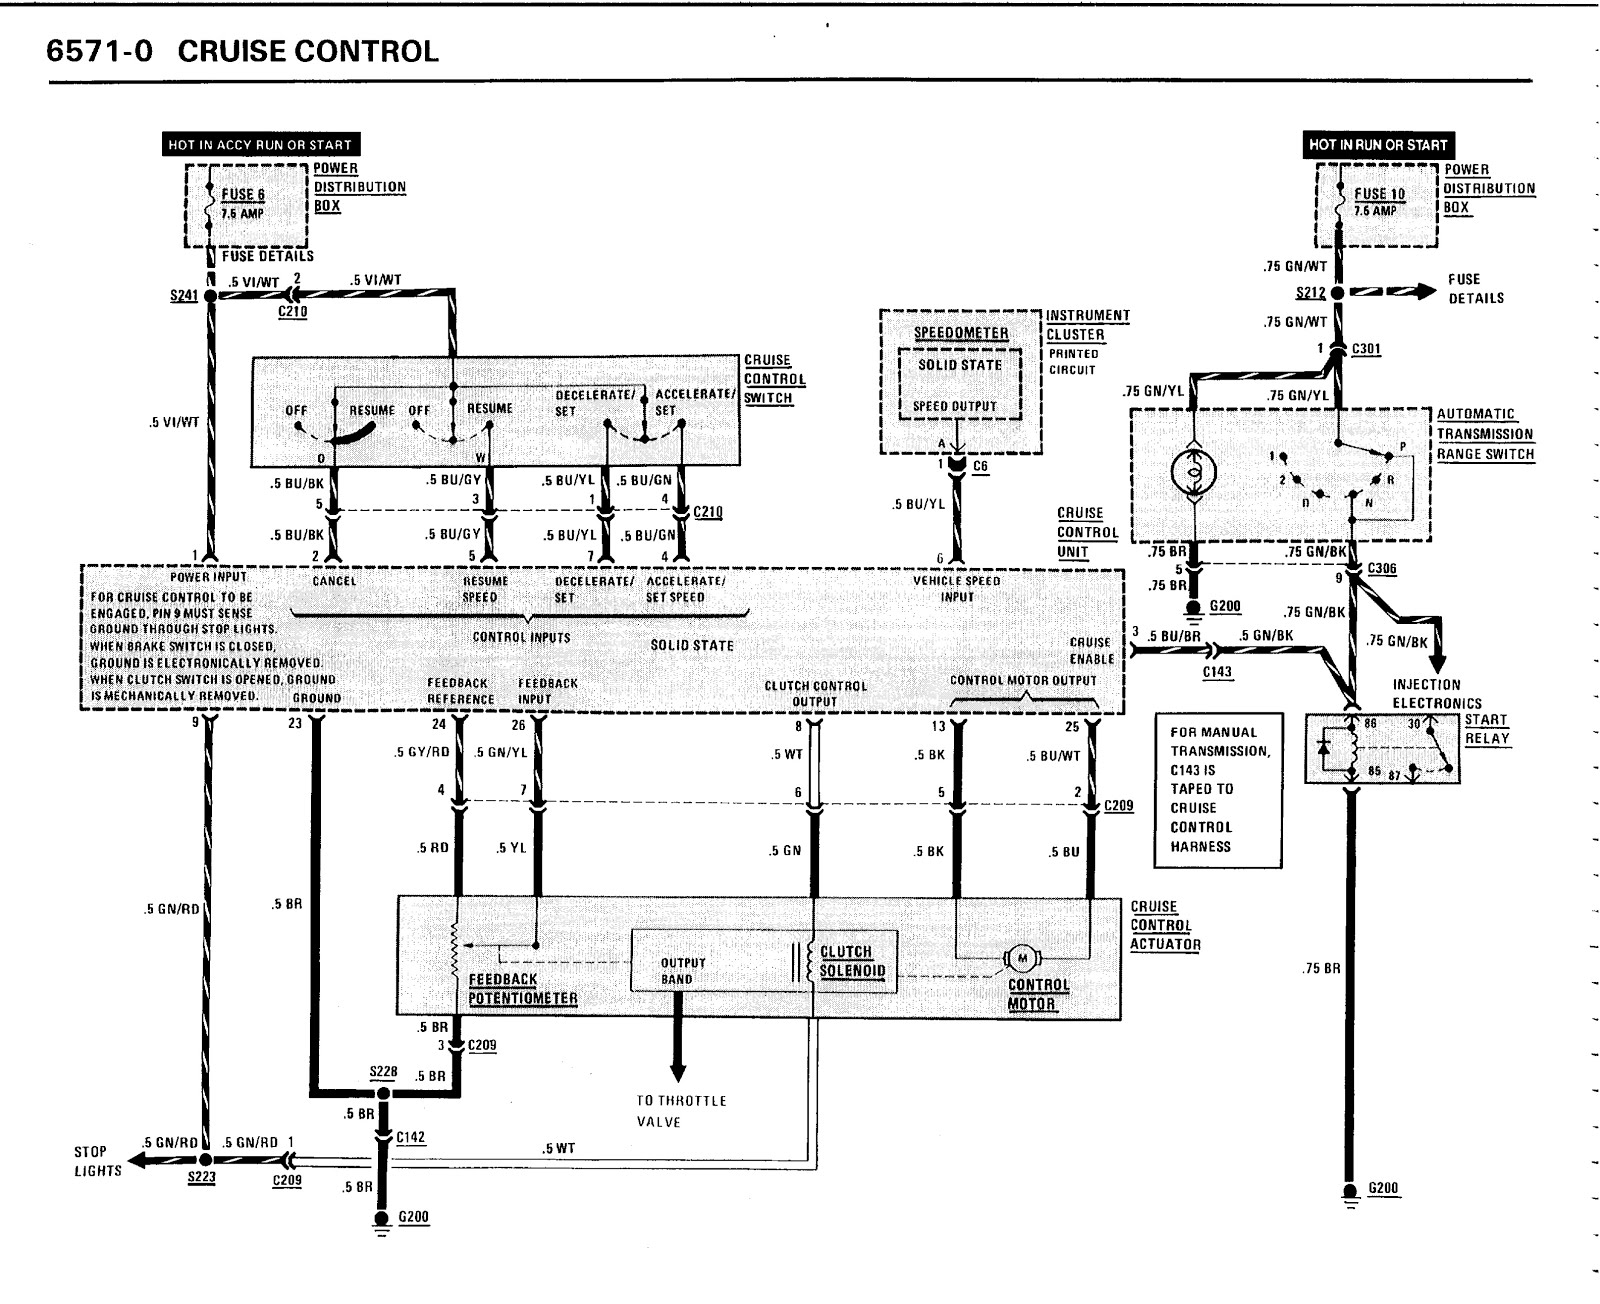 bmw e46 cruise control wiring diagram